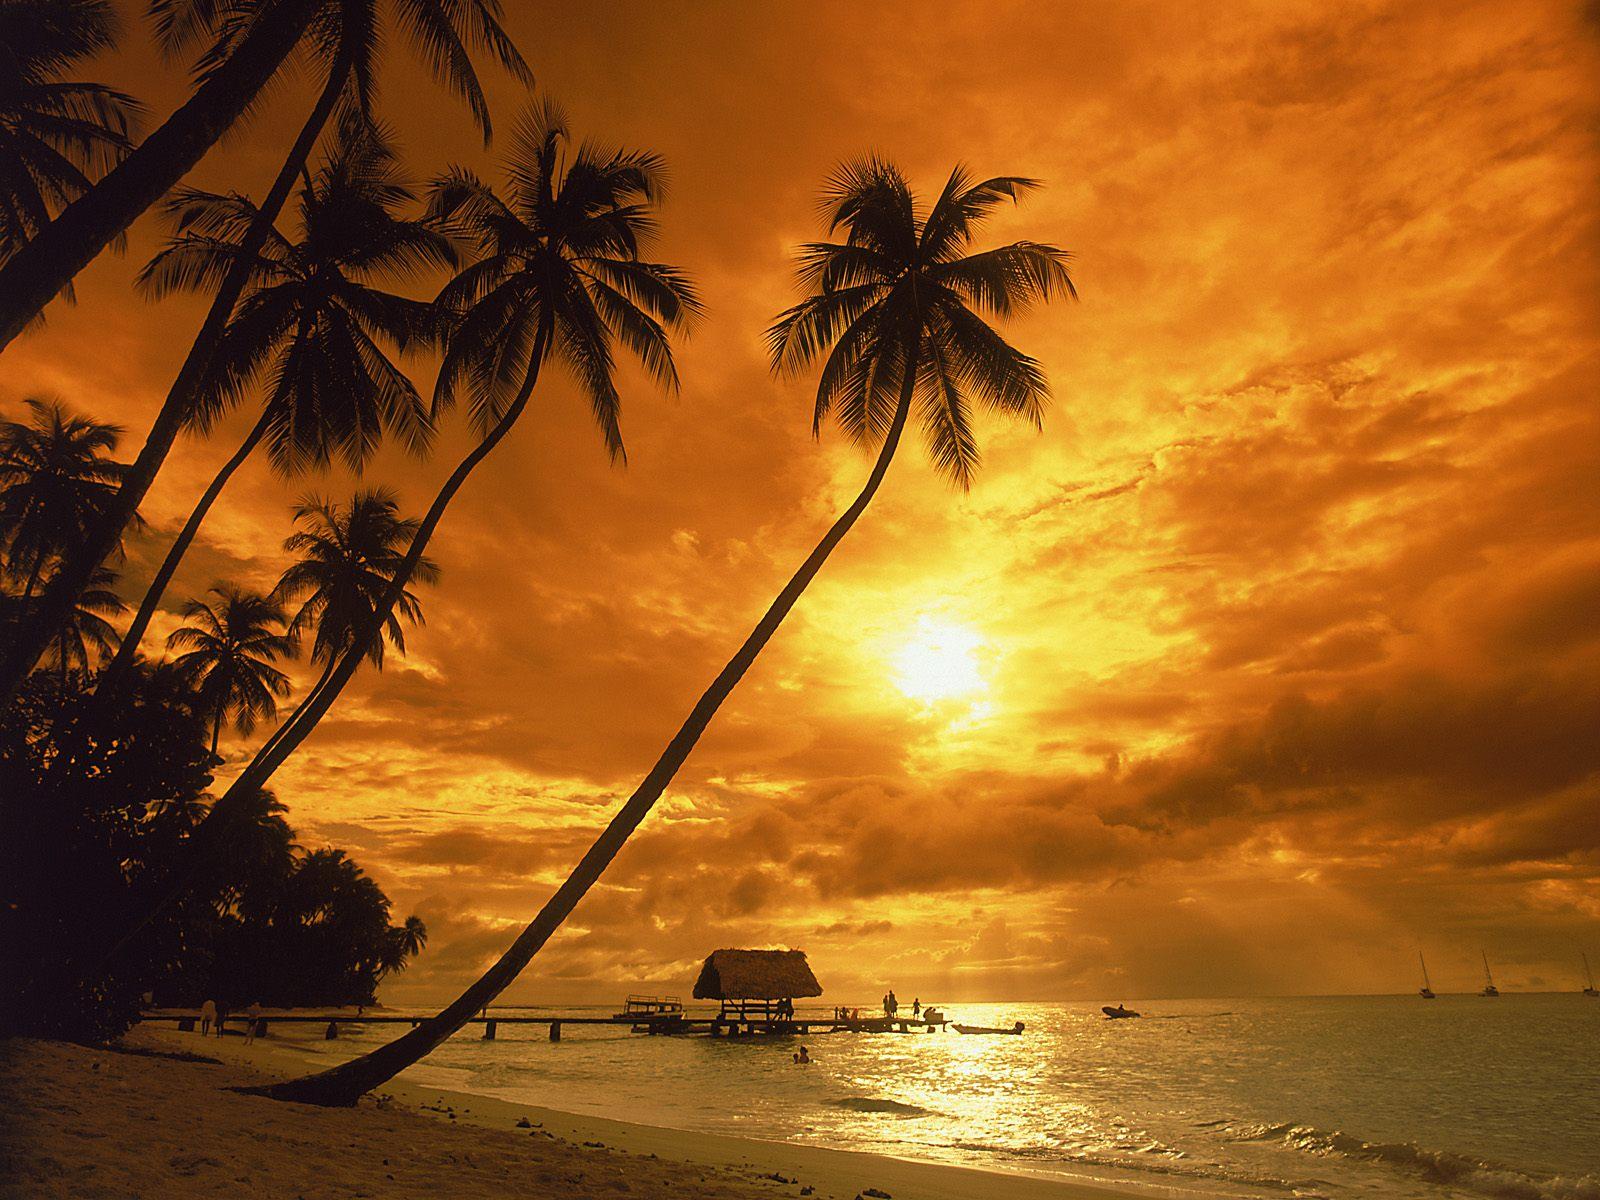 Papel de Parede Pôr-do-sol na Praia  Paradisíaco Wallpaper para ... 50f42fcb9d